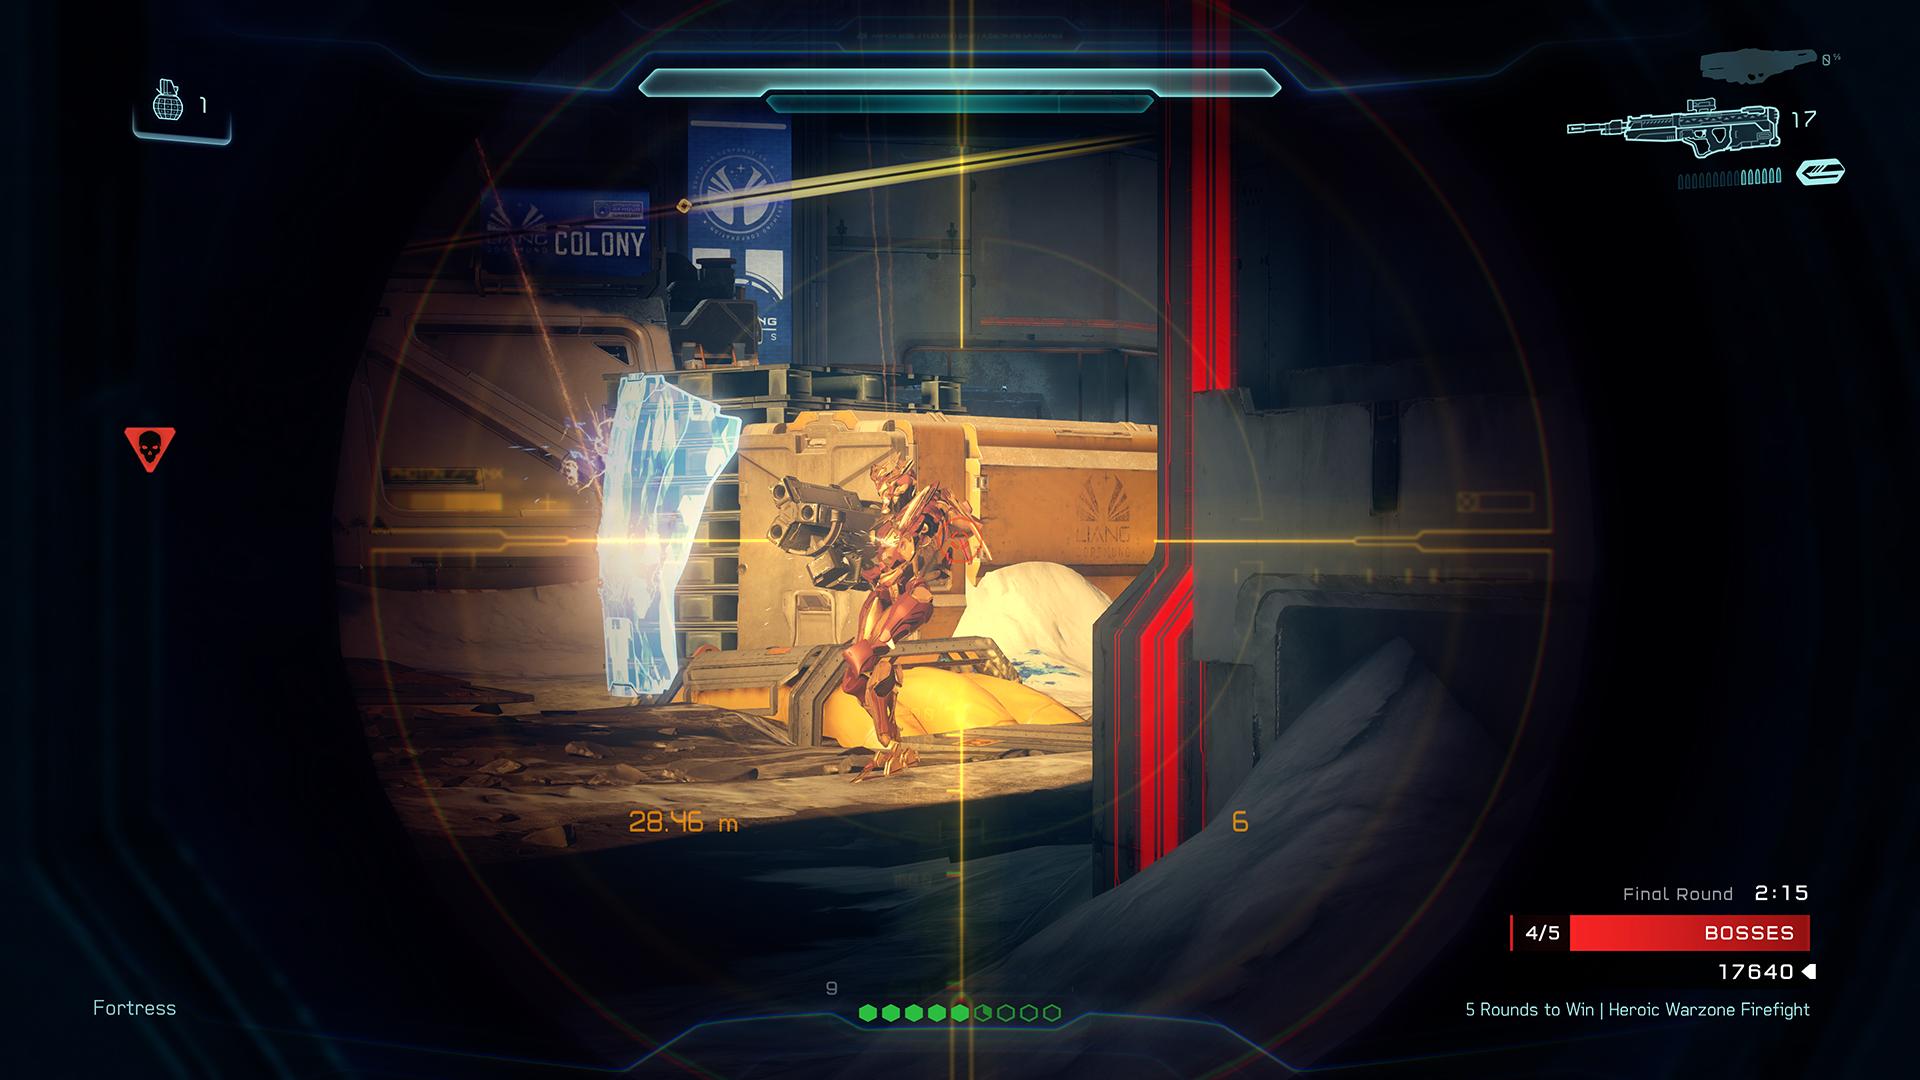 Halo 5: Guardians multiplayer boss screenshot